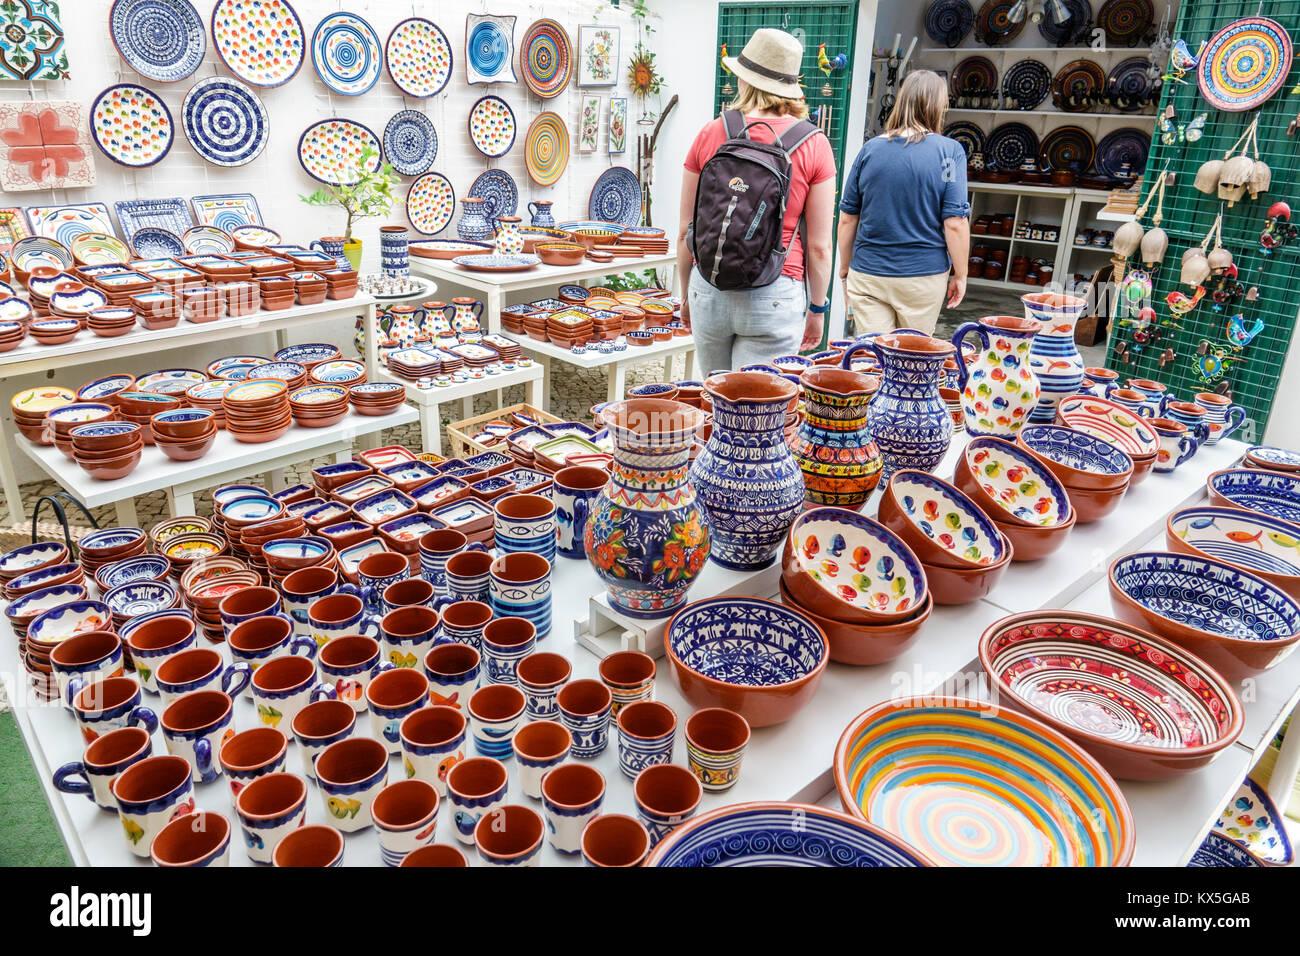 Lisbon Portugal Castelo quarter shopping store souvenir clay pottery plates platters vases mugs hand painted terracotta - Stock Image